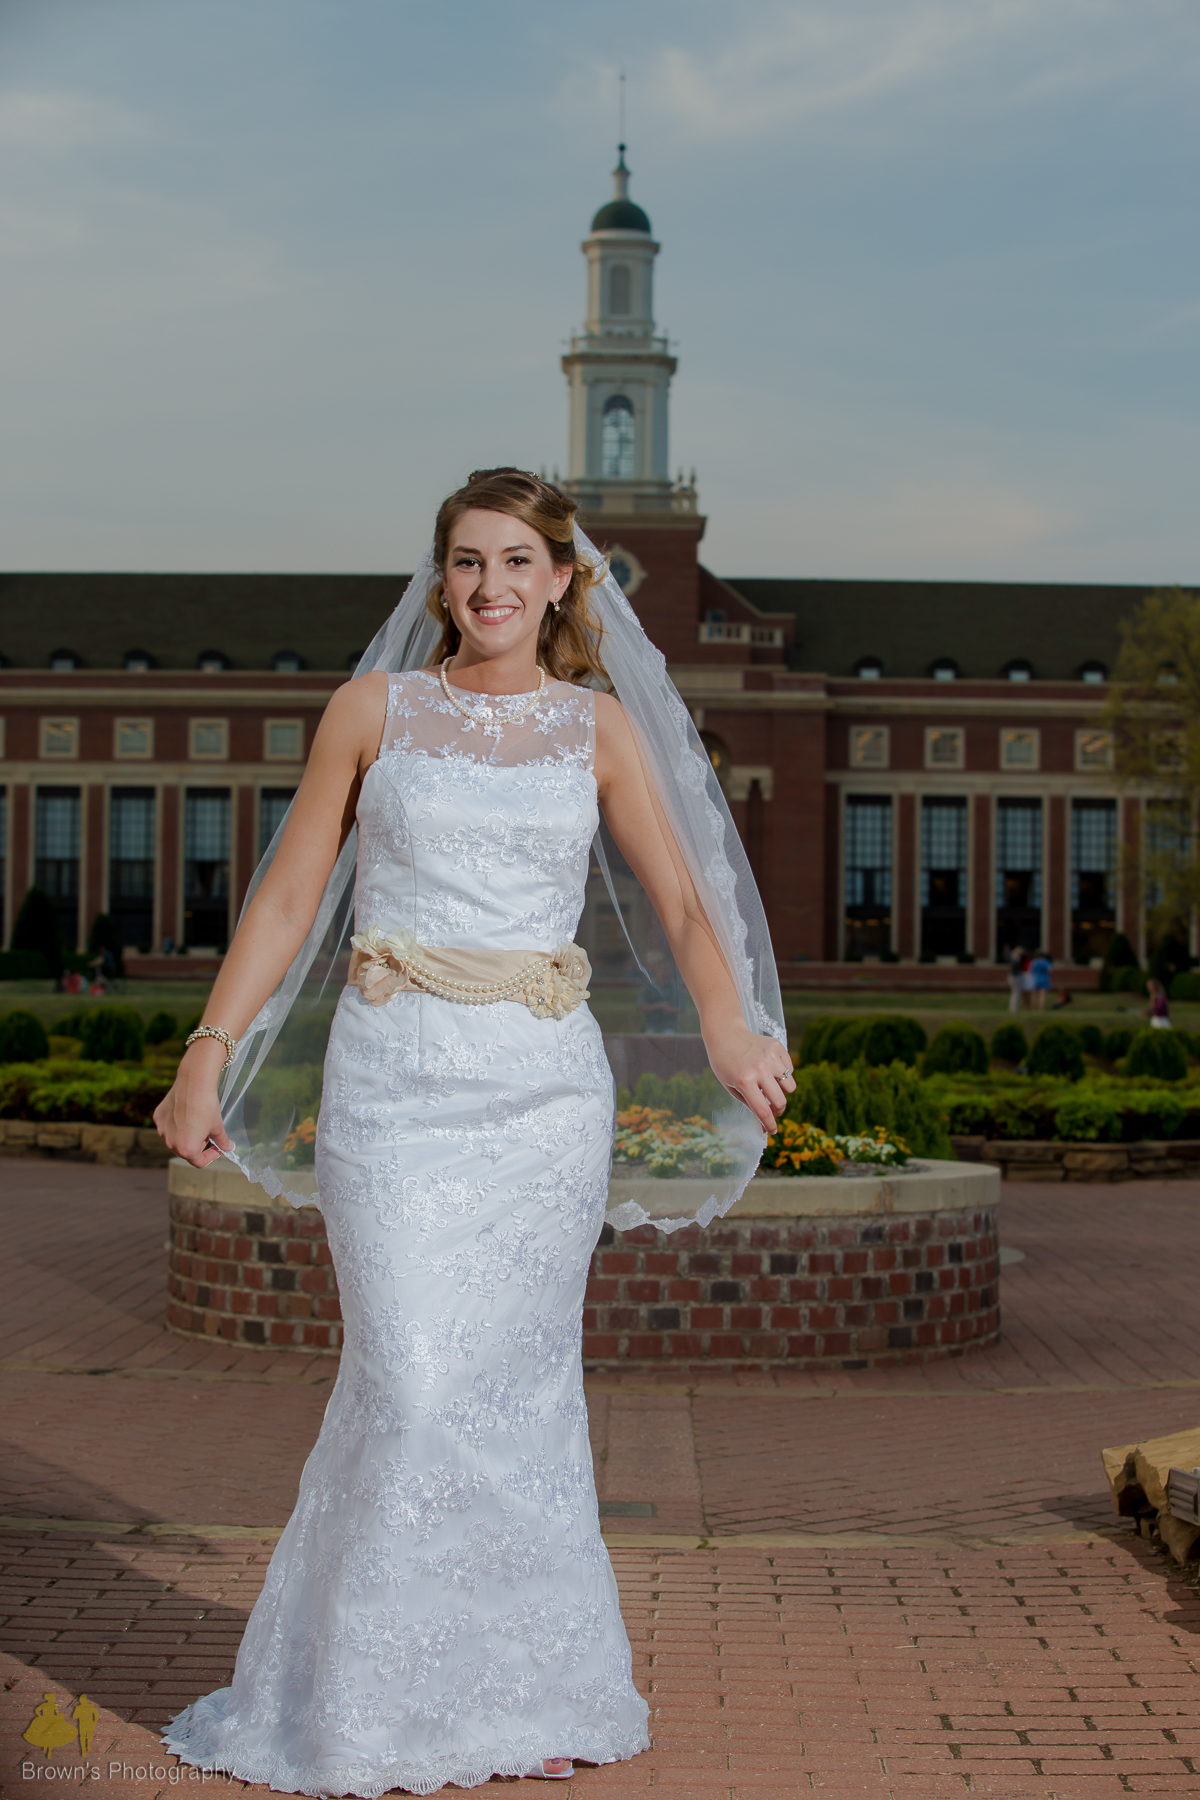 stillwater-wedding-photographer-1-3.jpg